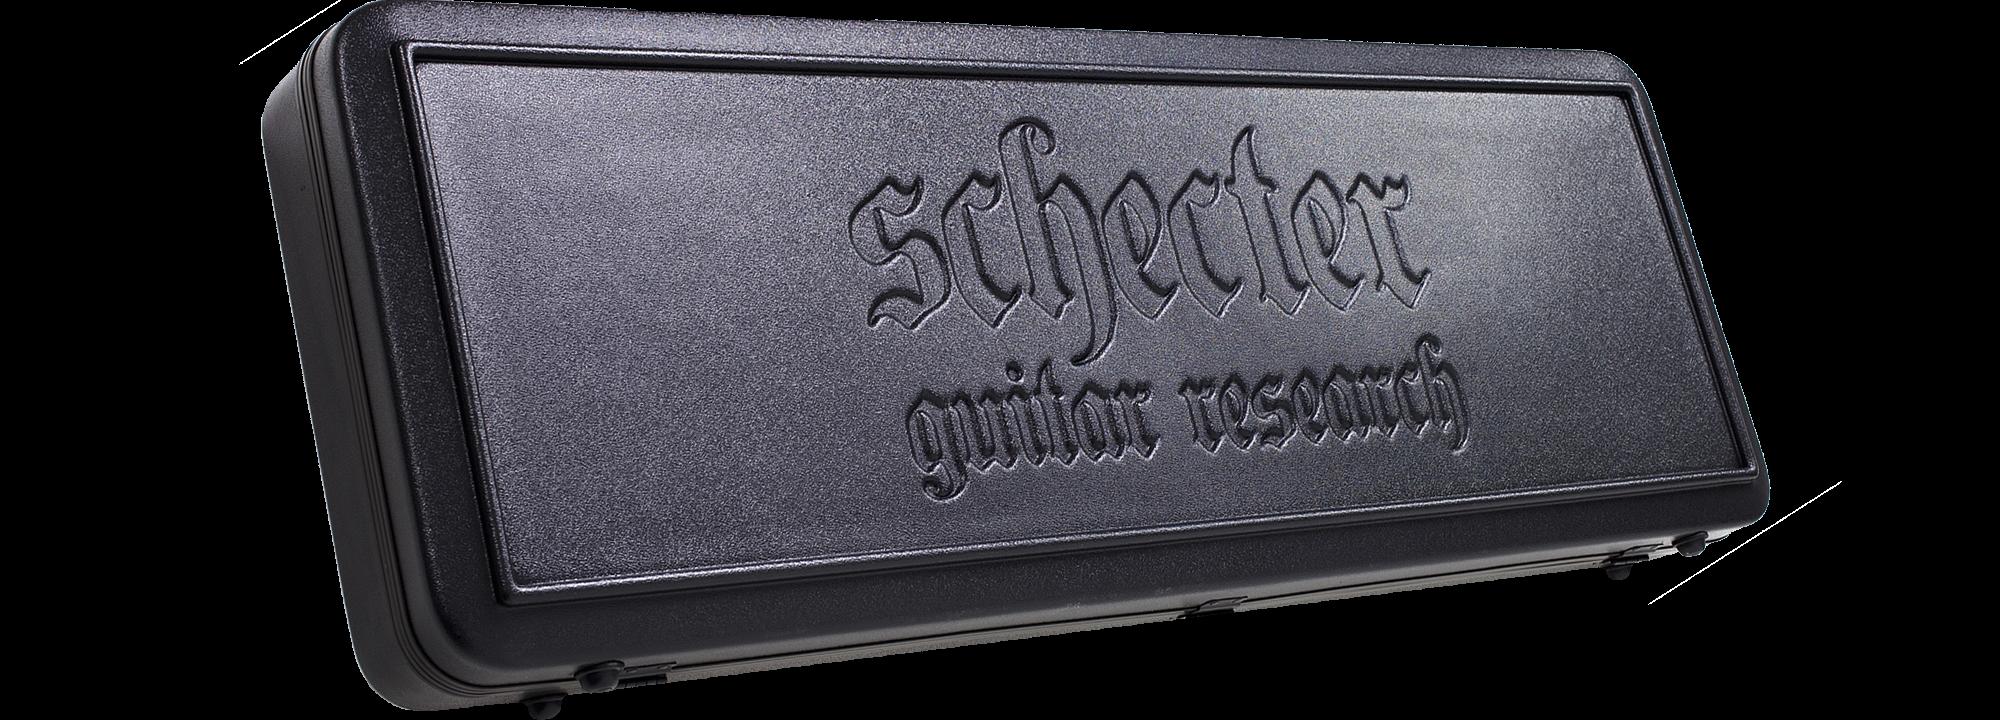 Schecter SGR-UNIV Universal Bass Hardshell Case